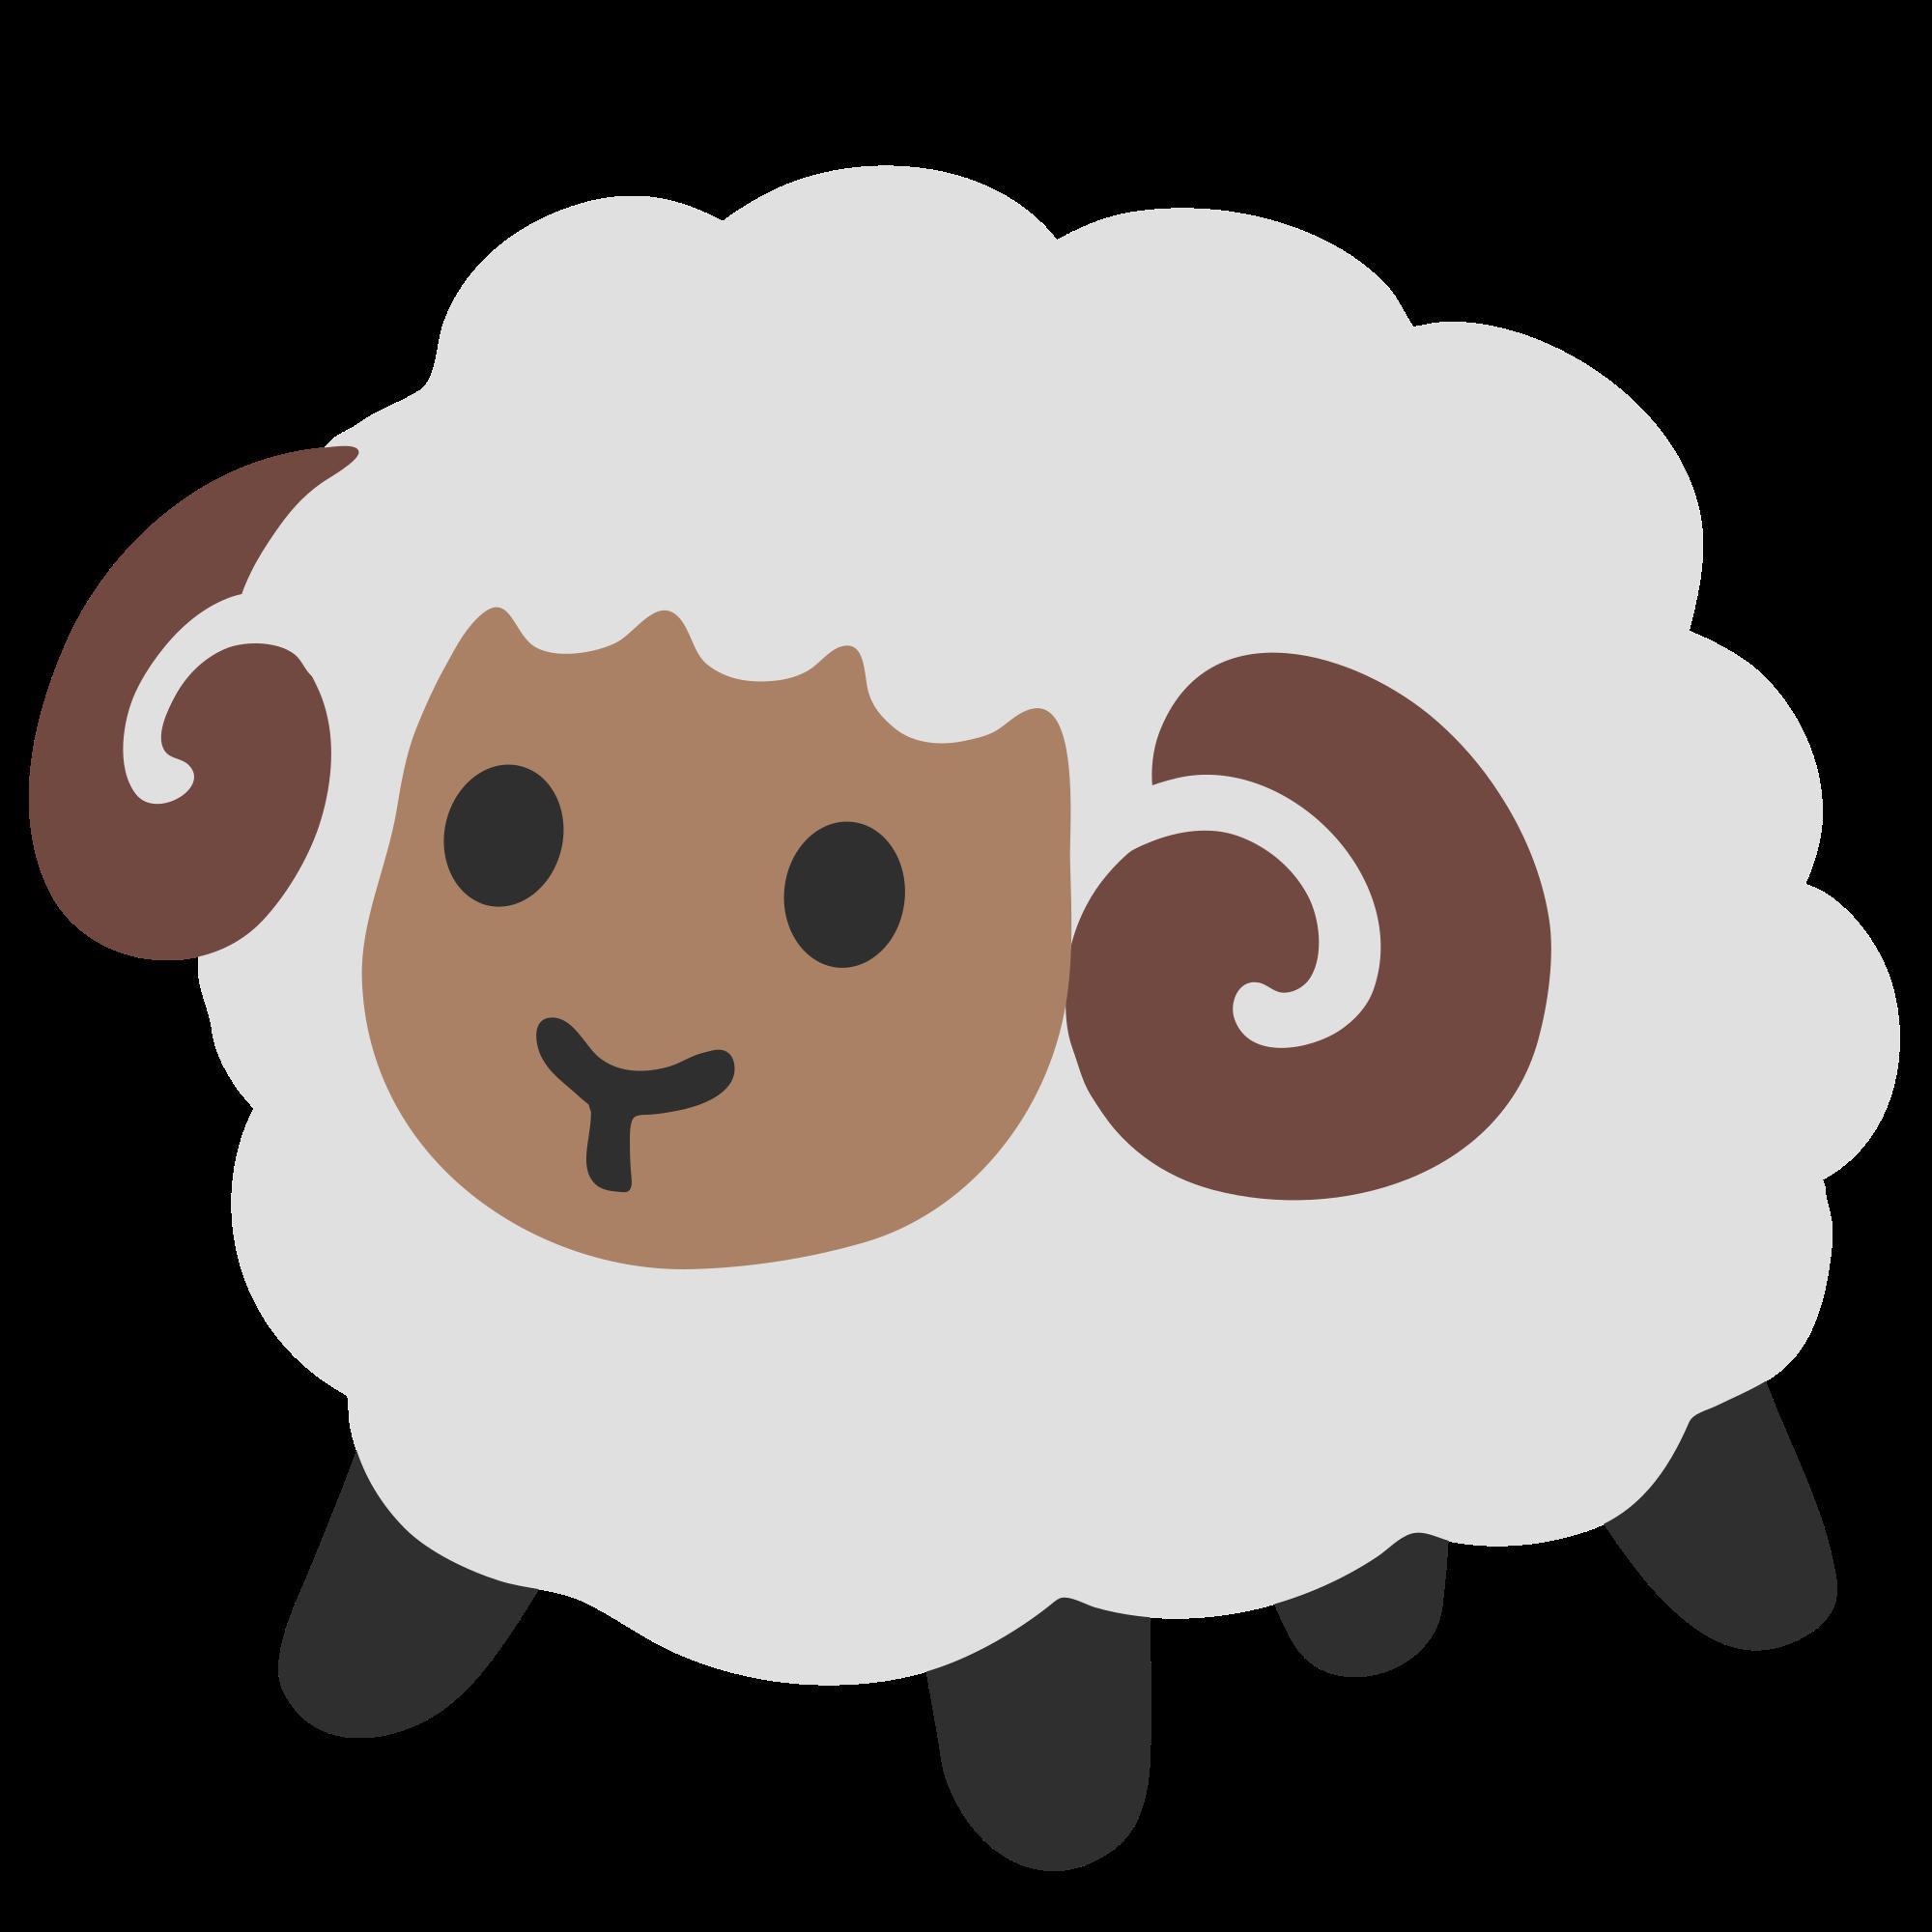 File emoji u f. Hedgehog clipart svg